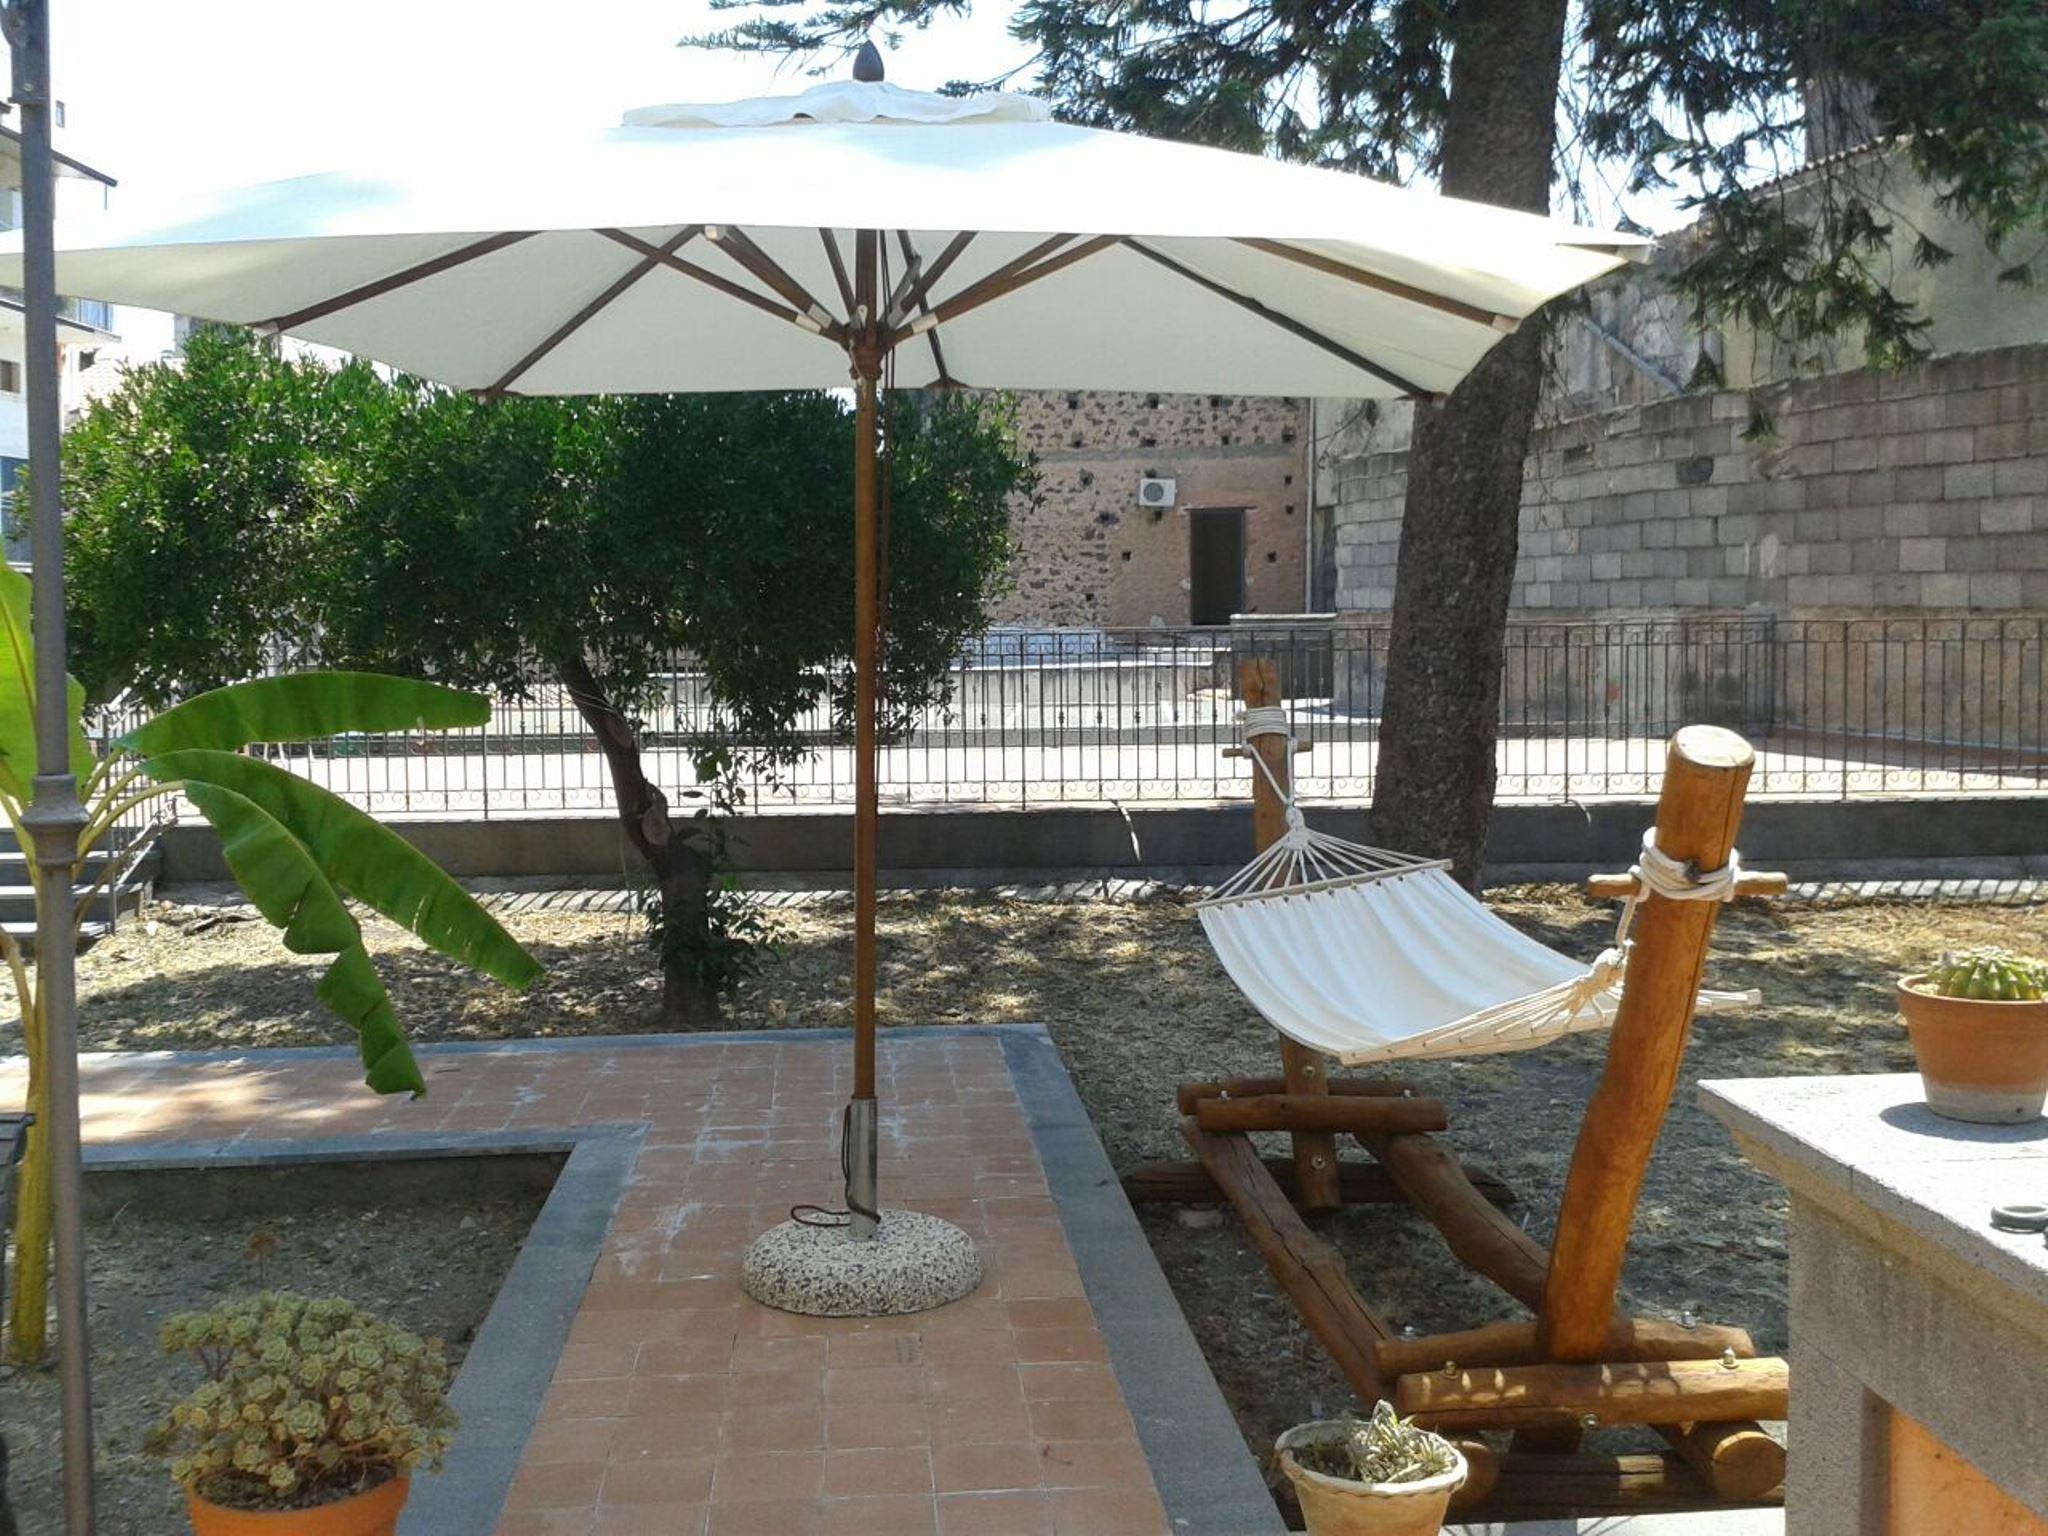 Maison de vacances A Casa di Ludo mit parkplatz (2124257), Catania, Catania, Sicile, Italie, image 38